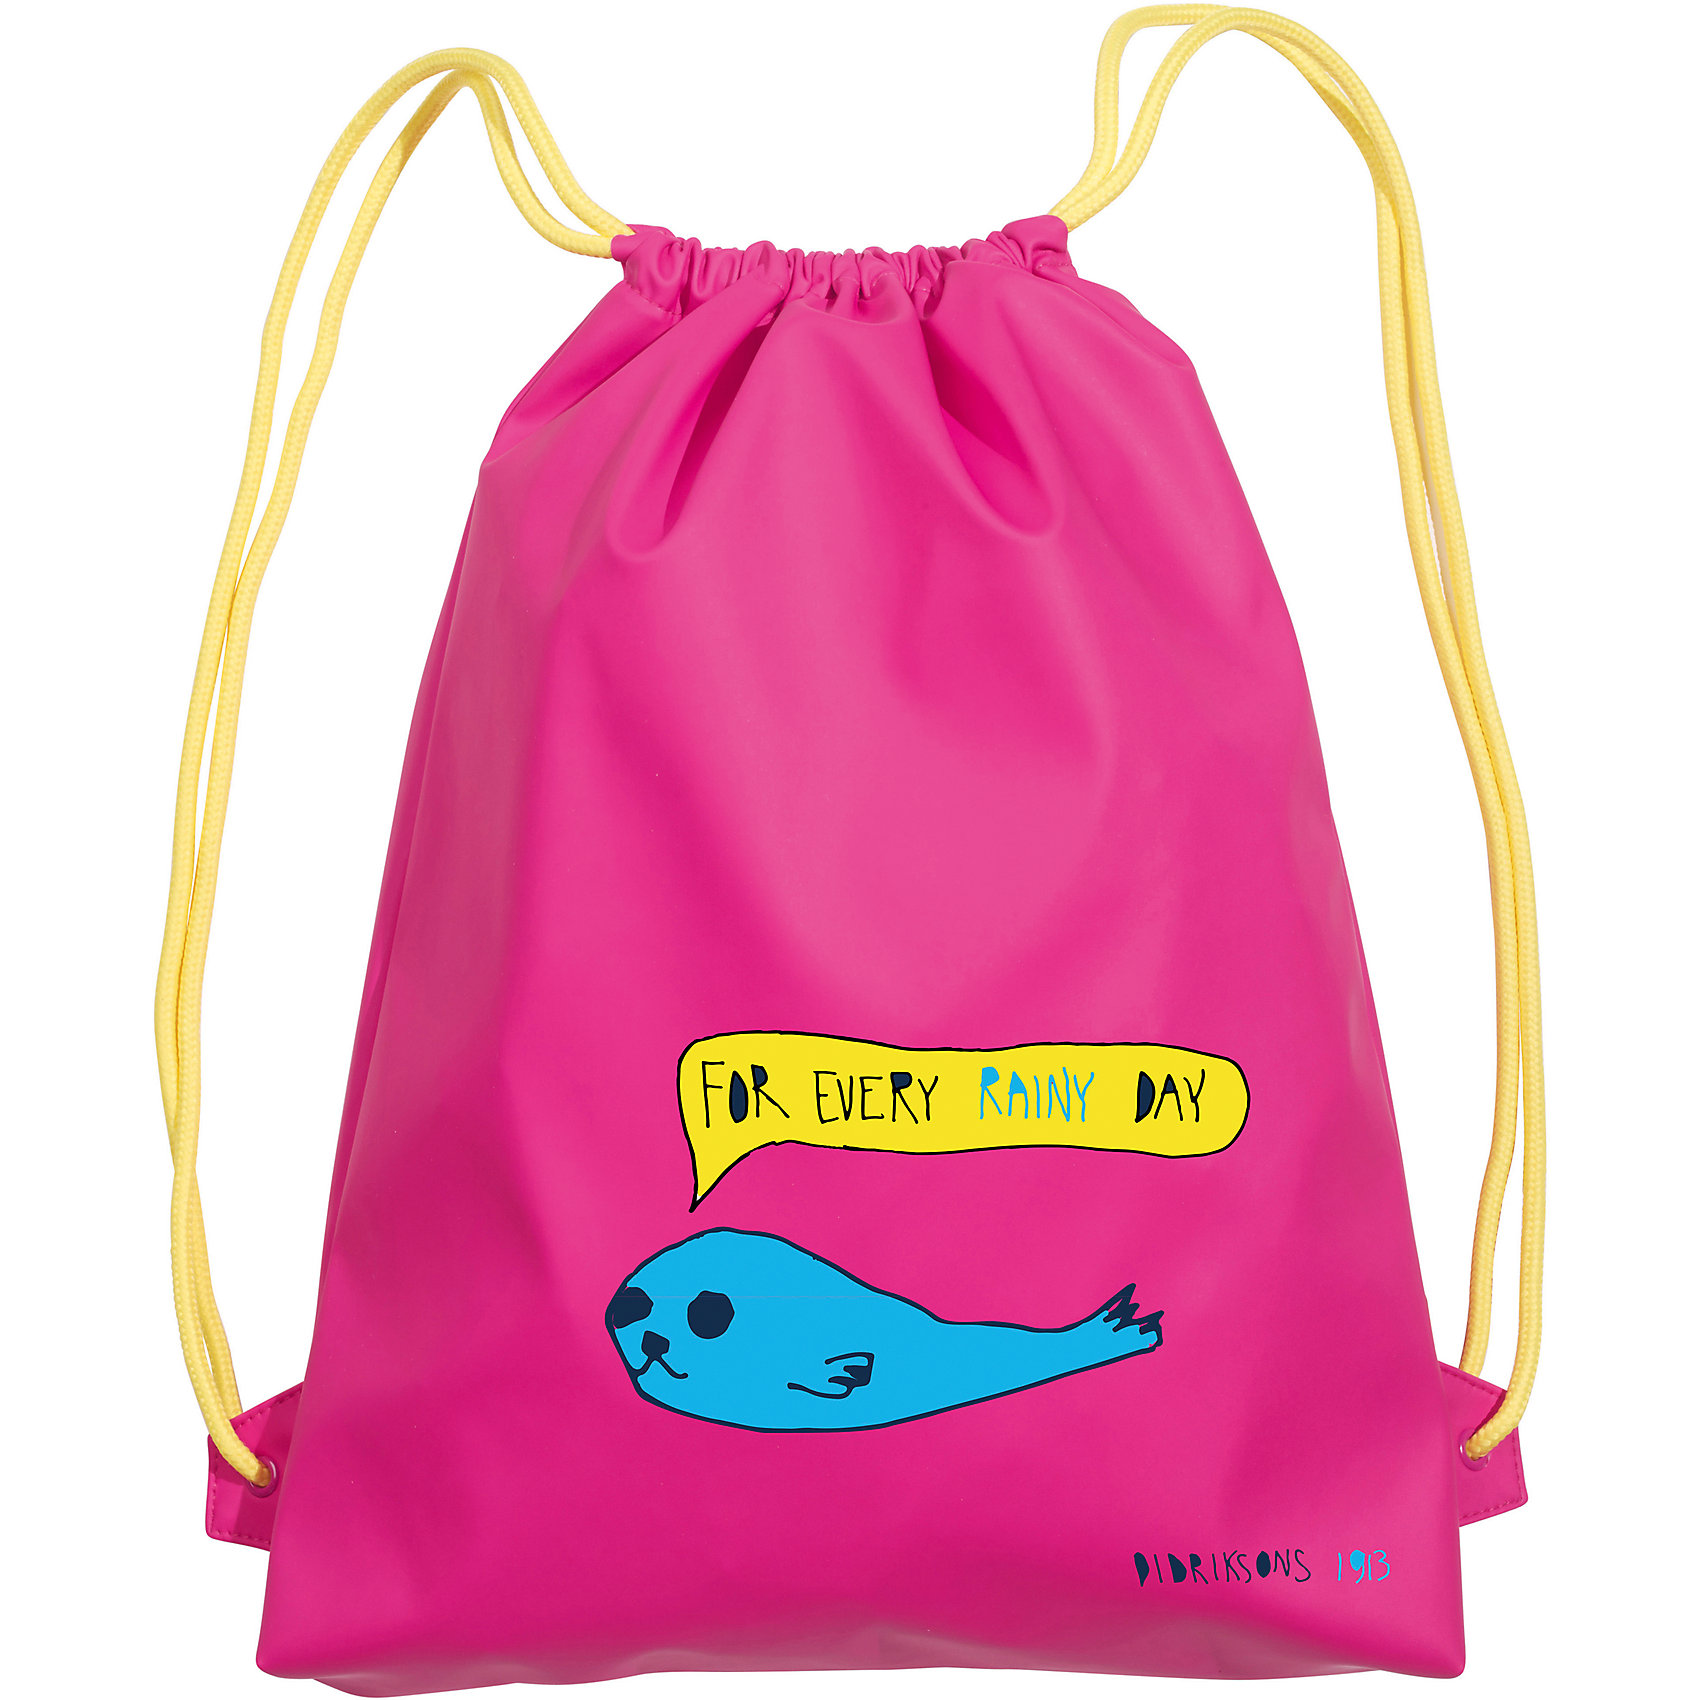 Рюкзак GALON для девочки DIDRIKSONSАксессуары<br>Рюкзак из абсолютно водонепроницаемого полиуретана Galon. <br>Состав:<br>Верх - 100% полиуретан, подкладка - 100% полиэстер<br><br>Ширина мм: 227<br>Глубина мм: 11<br>Высота мм: 226<br>Вес г: 350<br>Цвет: розовый<br>Возраст от месяцев: 36<br>Возраст до месяцев: 120<br>Пол: Женский<br>Возраст: Детский<br>Размер: one size<br>SKU: 5527316